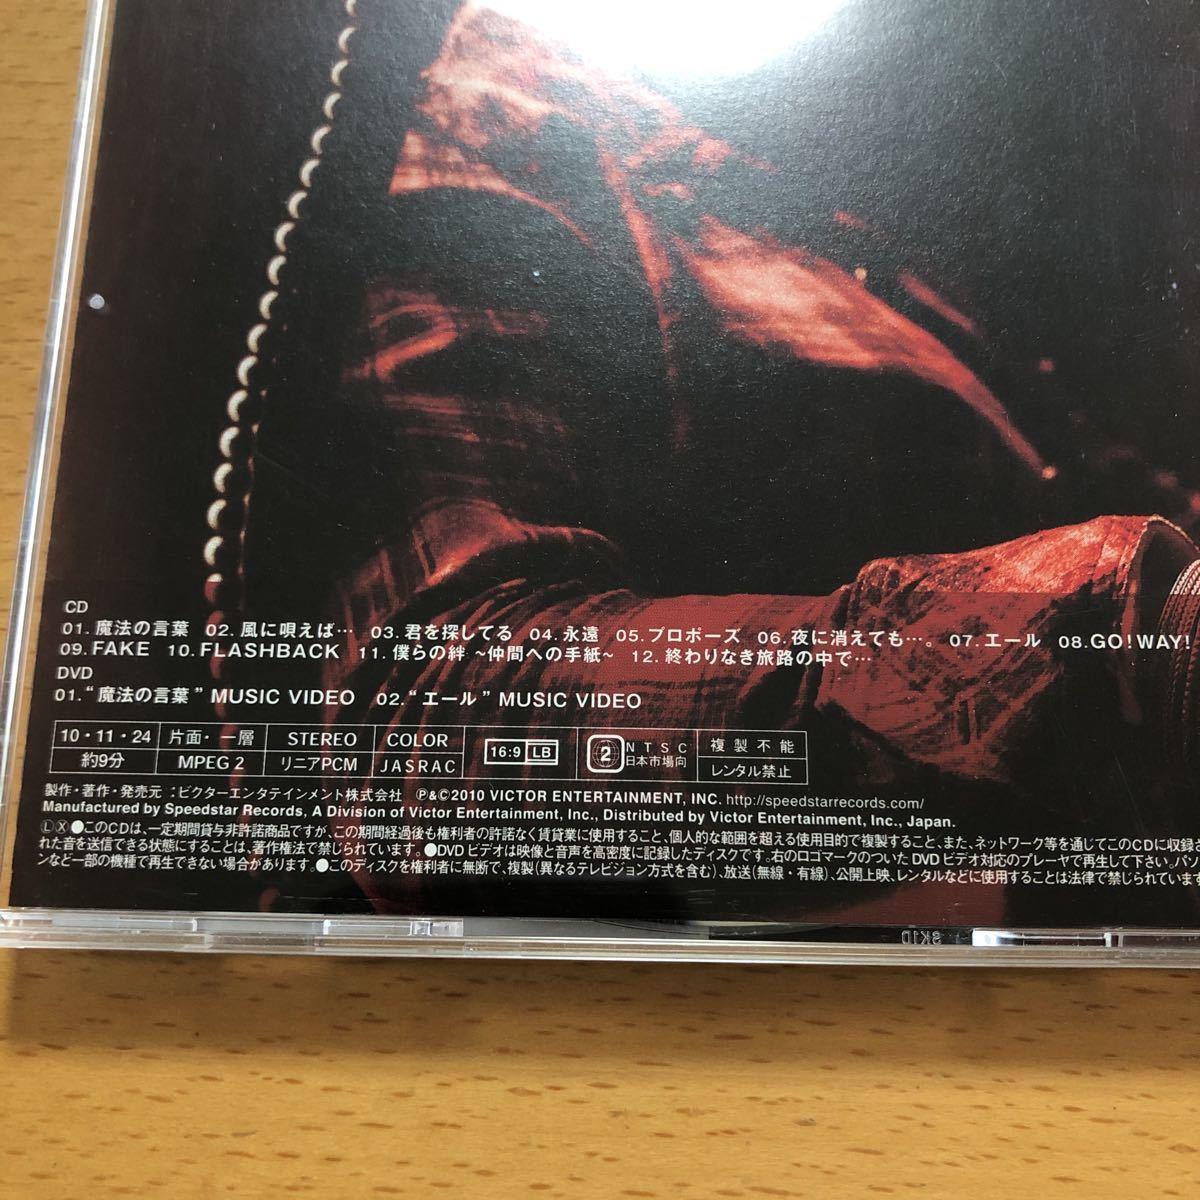 清木場俊介『ROCK&SOUL』初回限定盤CD+DVD☆帯付☆美品☆アルバム☆71_画像5